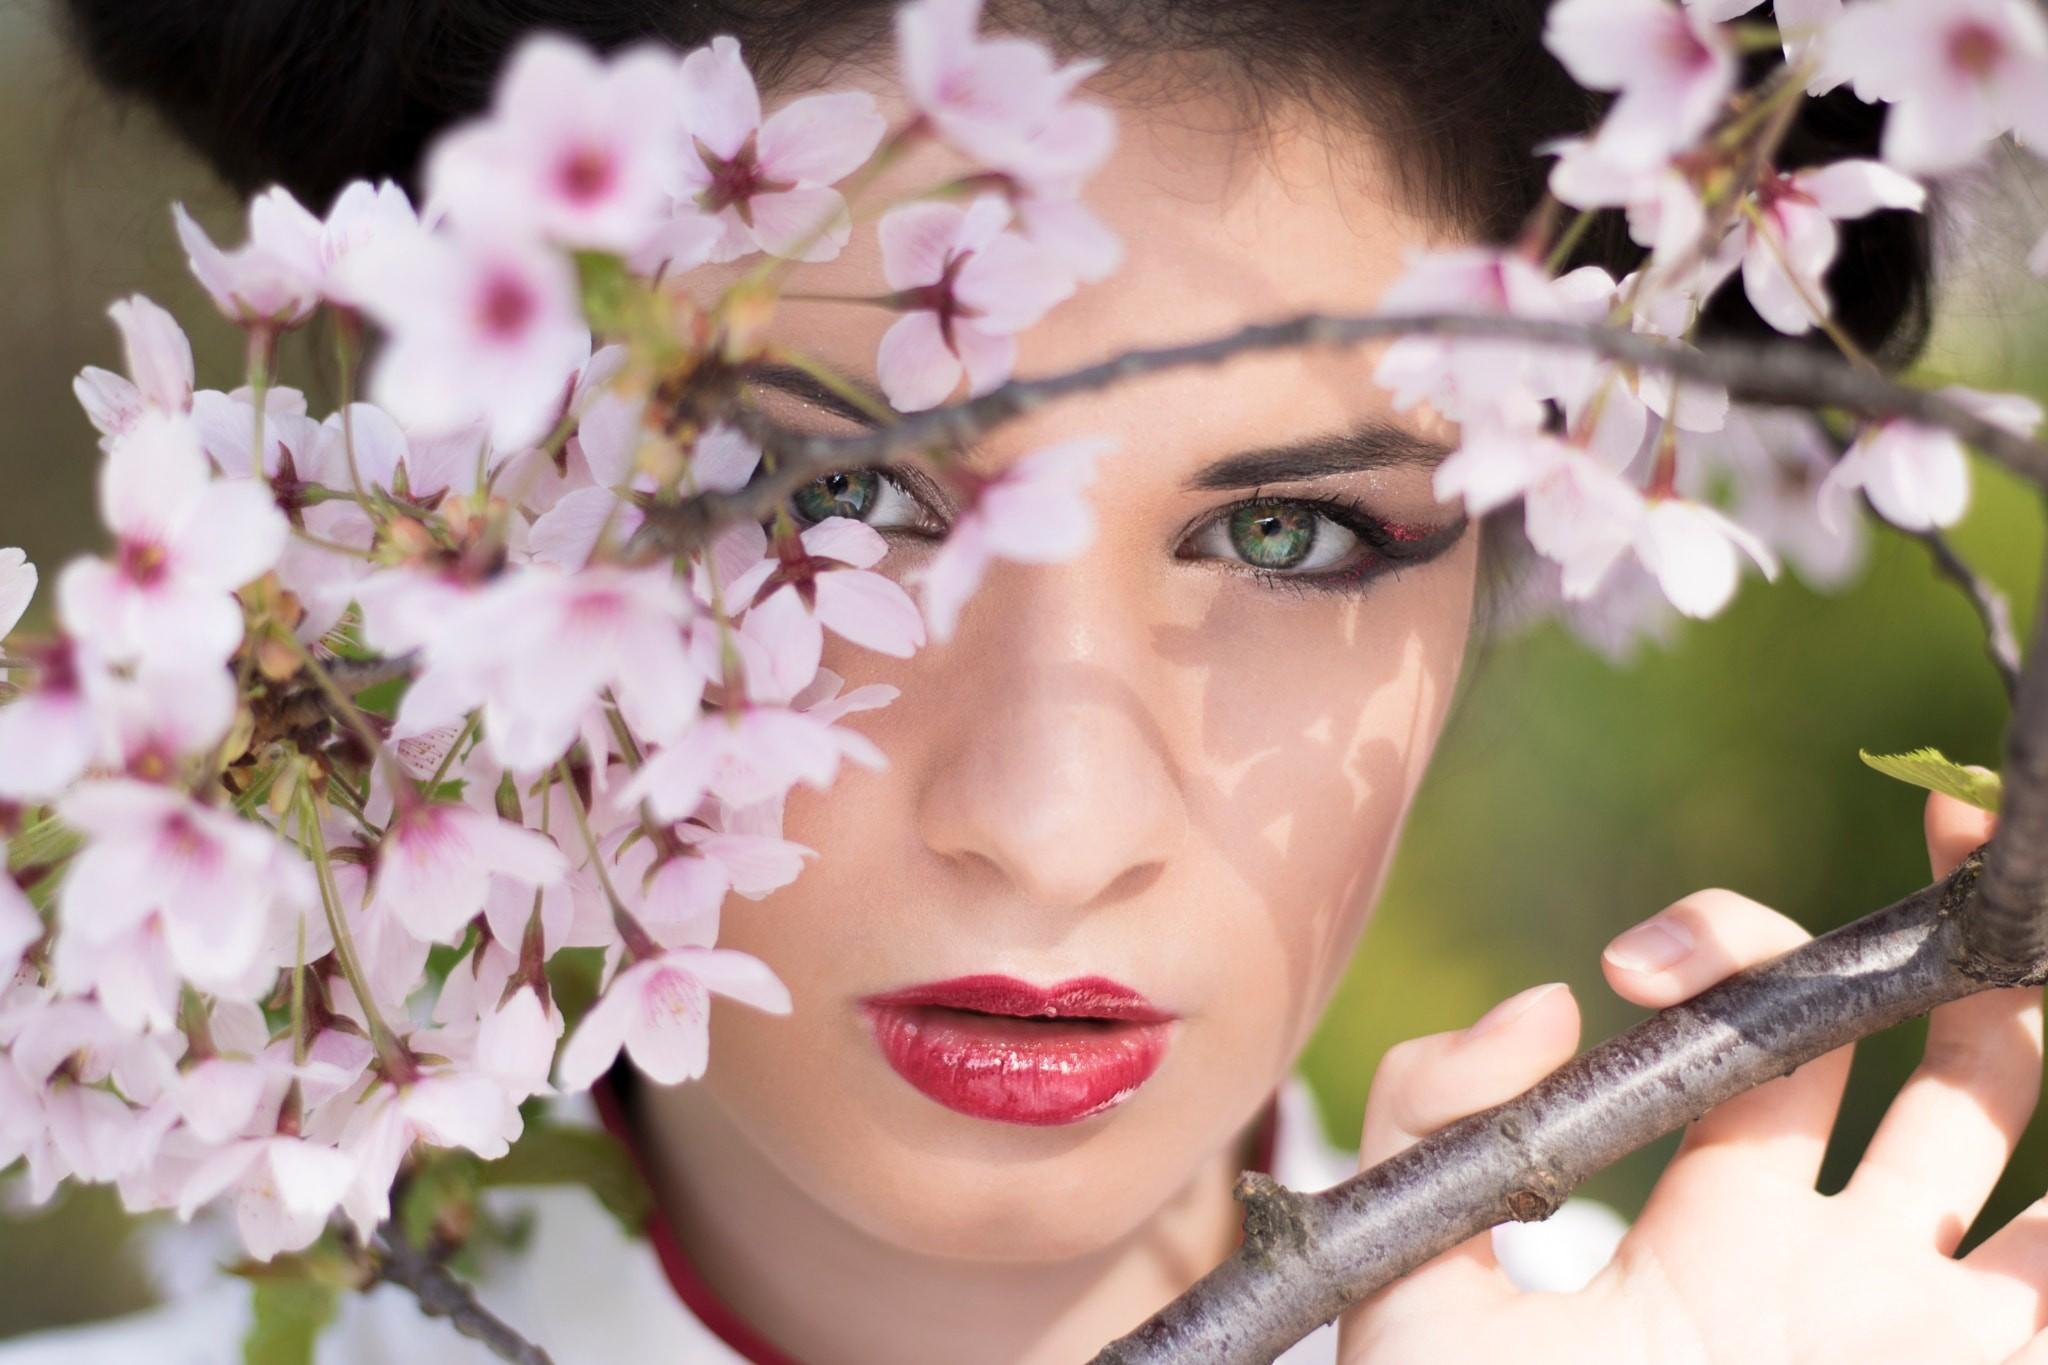 People 2048x1365 Peter Jordanoff cherry blossom women face model